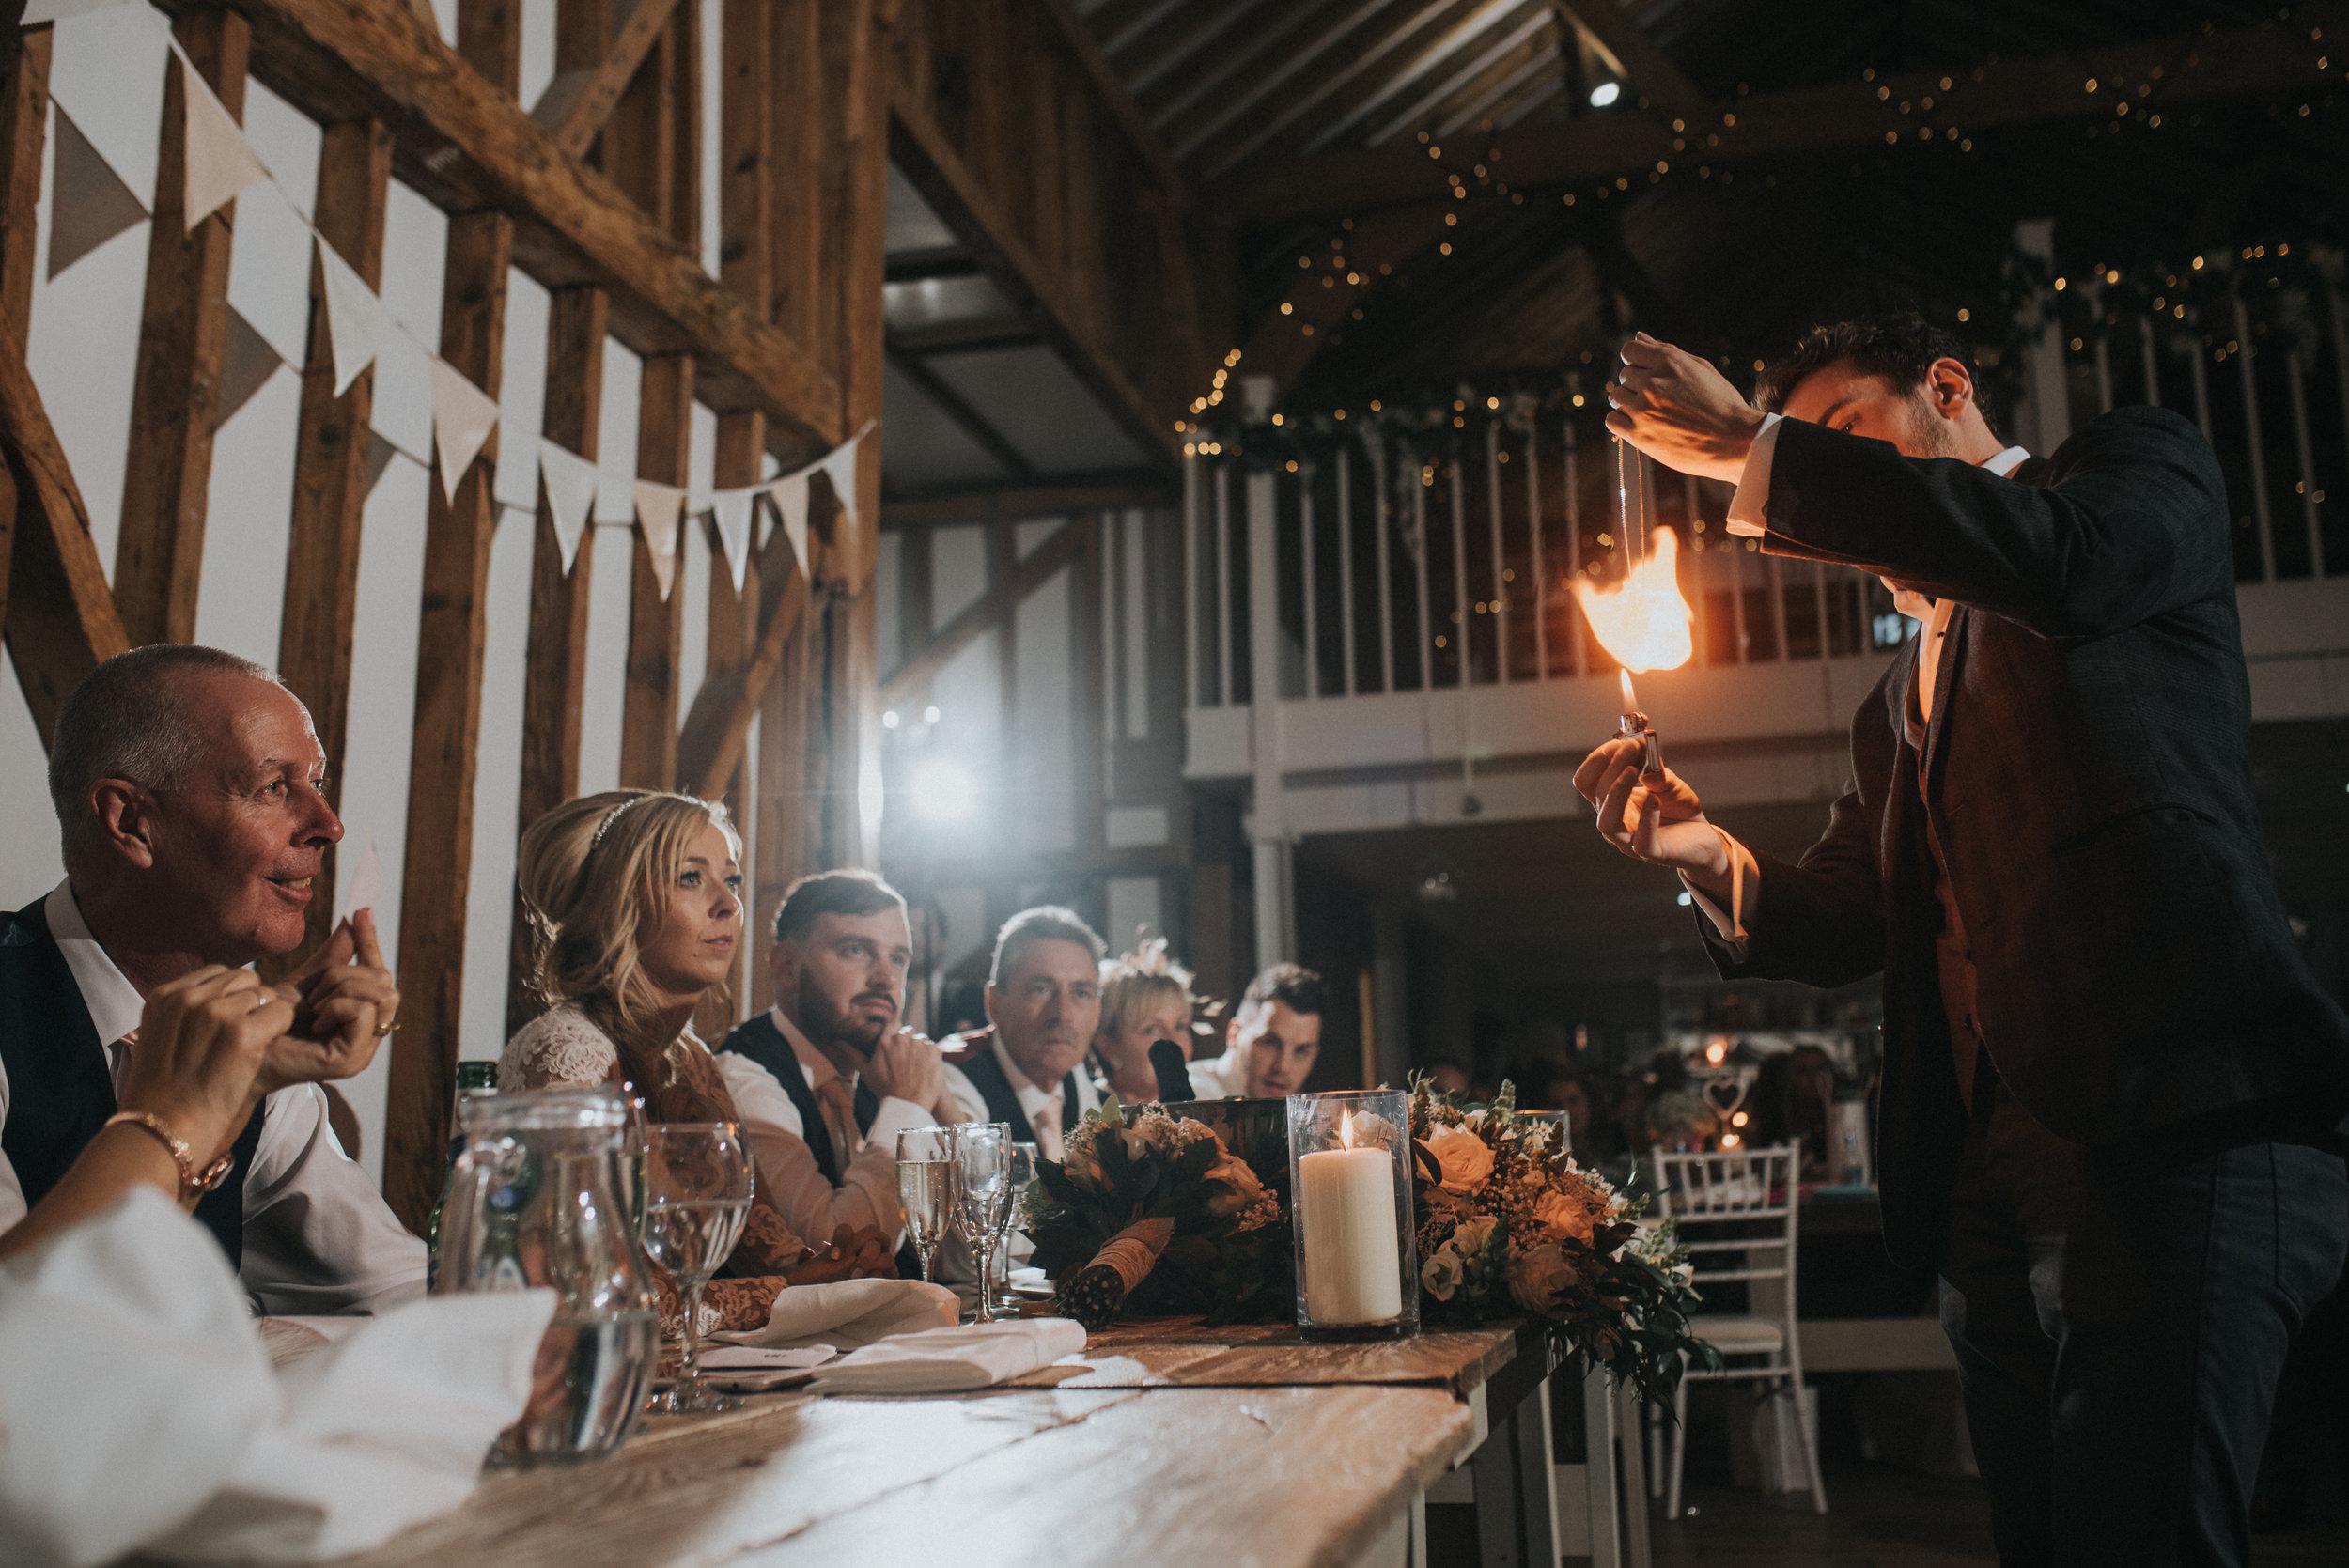 london-hertfordshire-wedding-photography-milling-barn-portrait-64